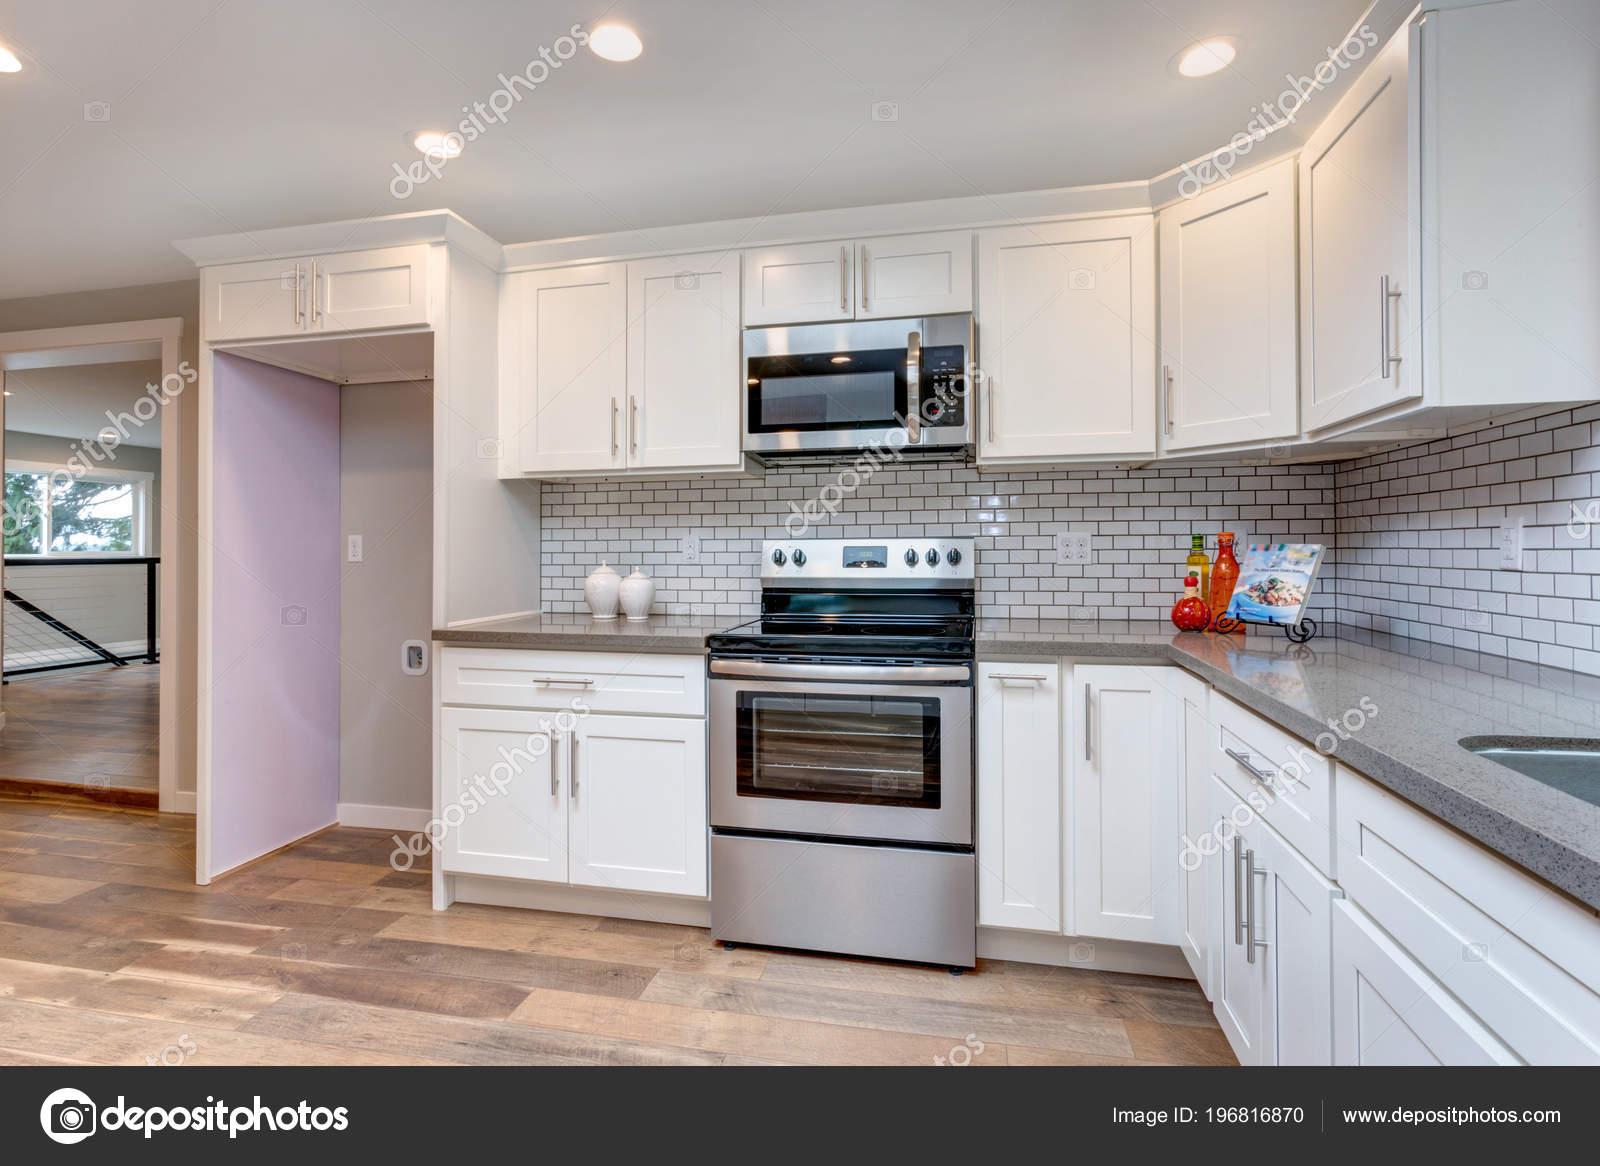 grey kitchen backsplash wall hangings 开放式概念厨房与白色橱柜灰色石英台面和瓷砖橱柜 图库照片 c alabn